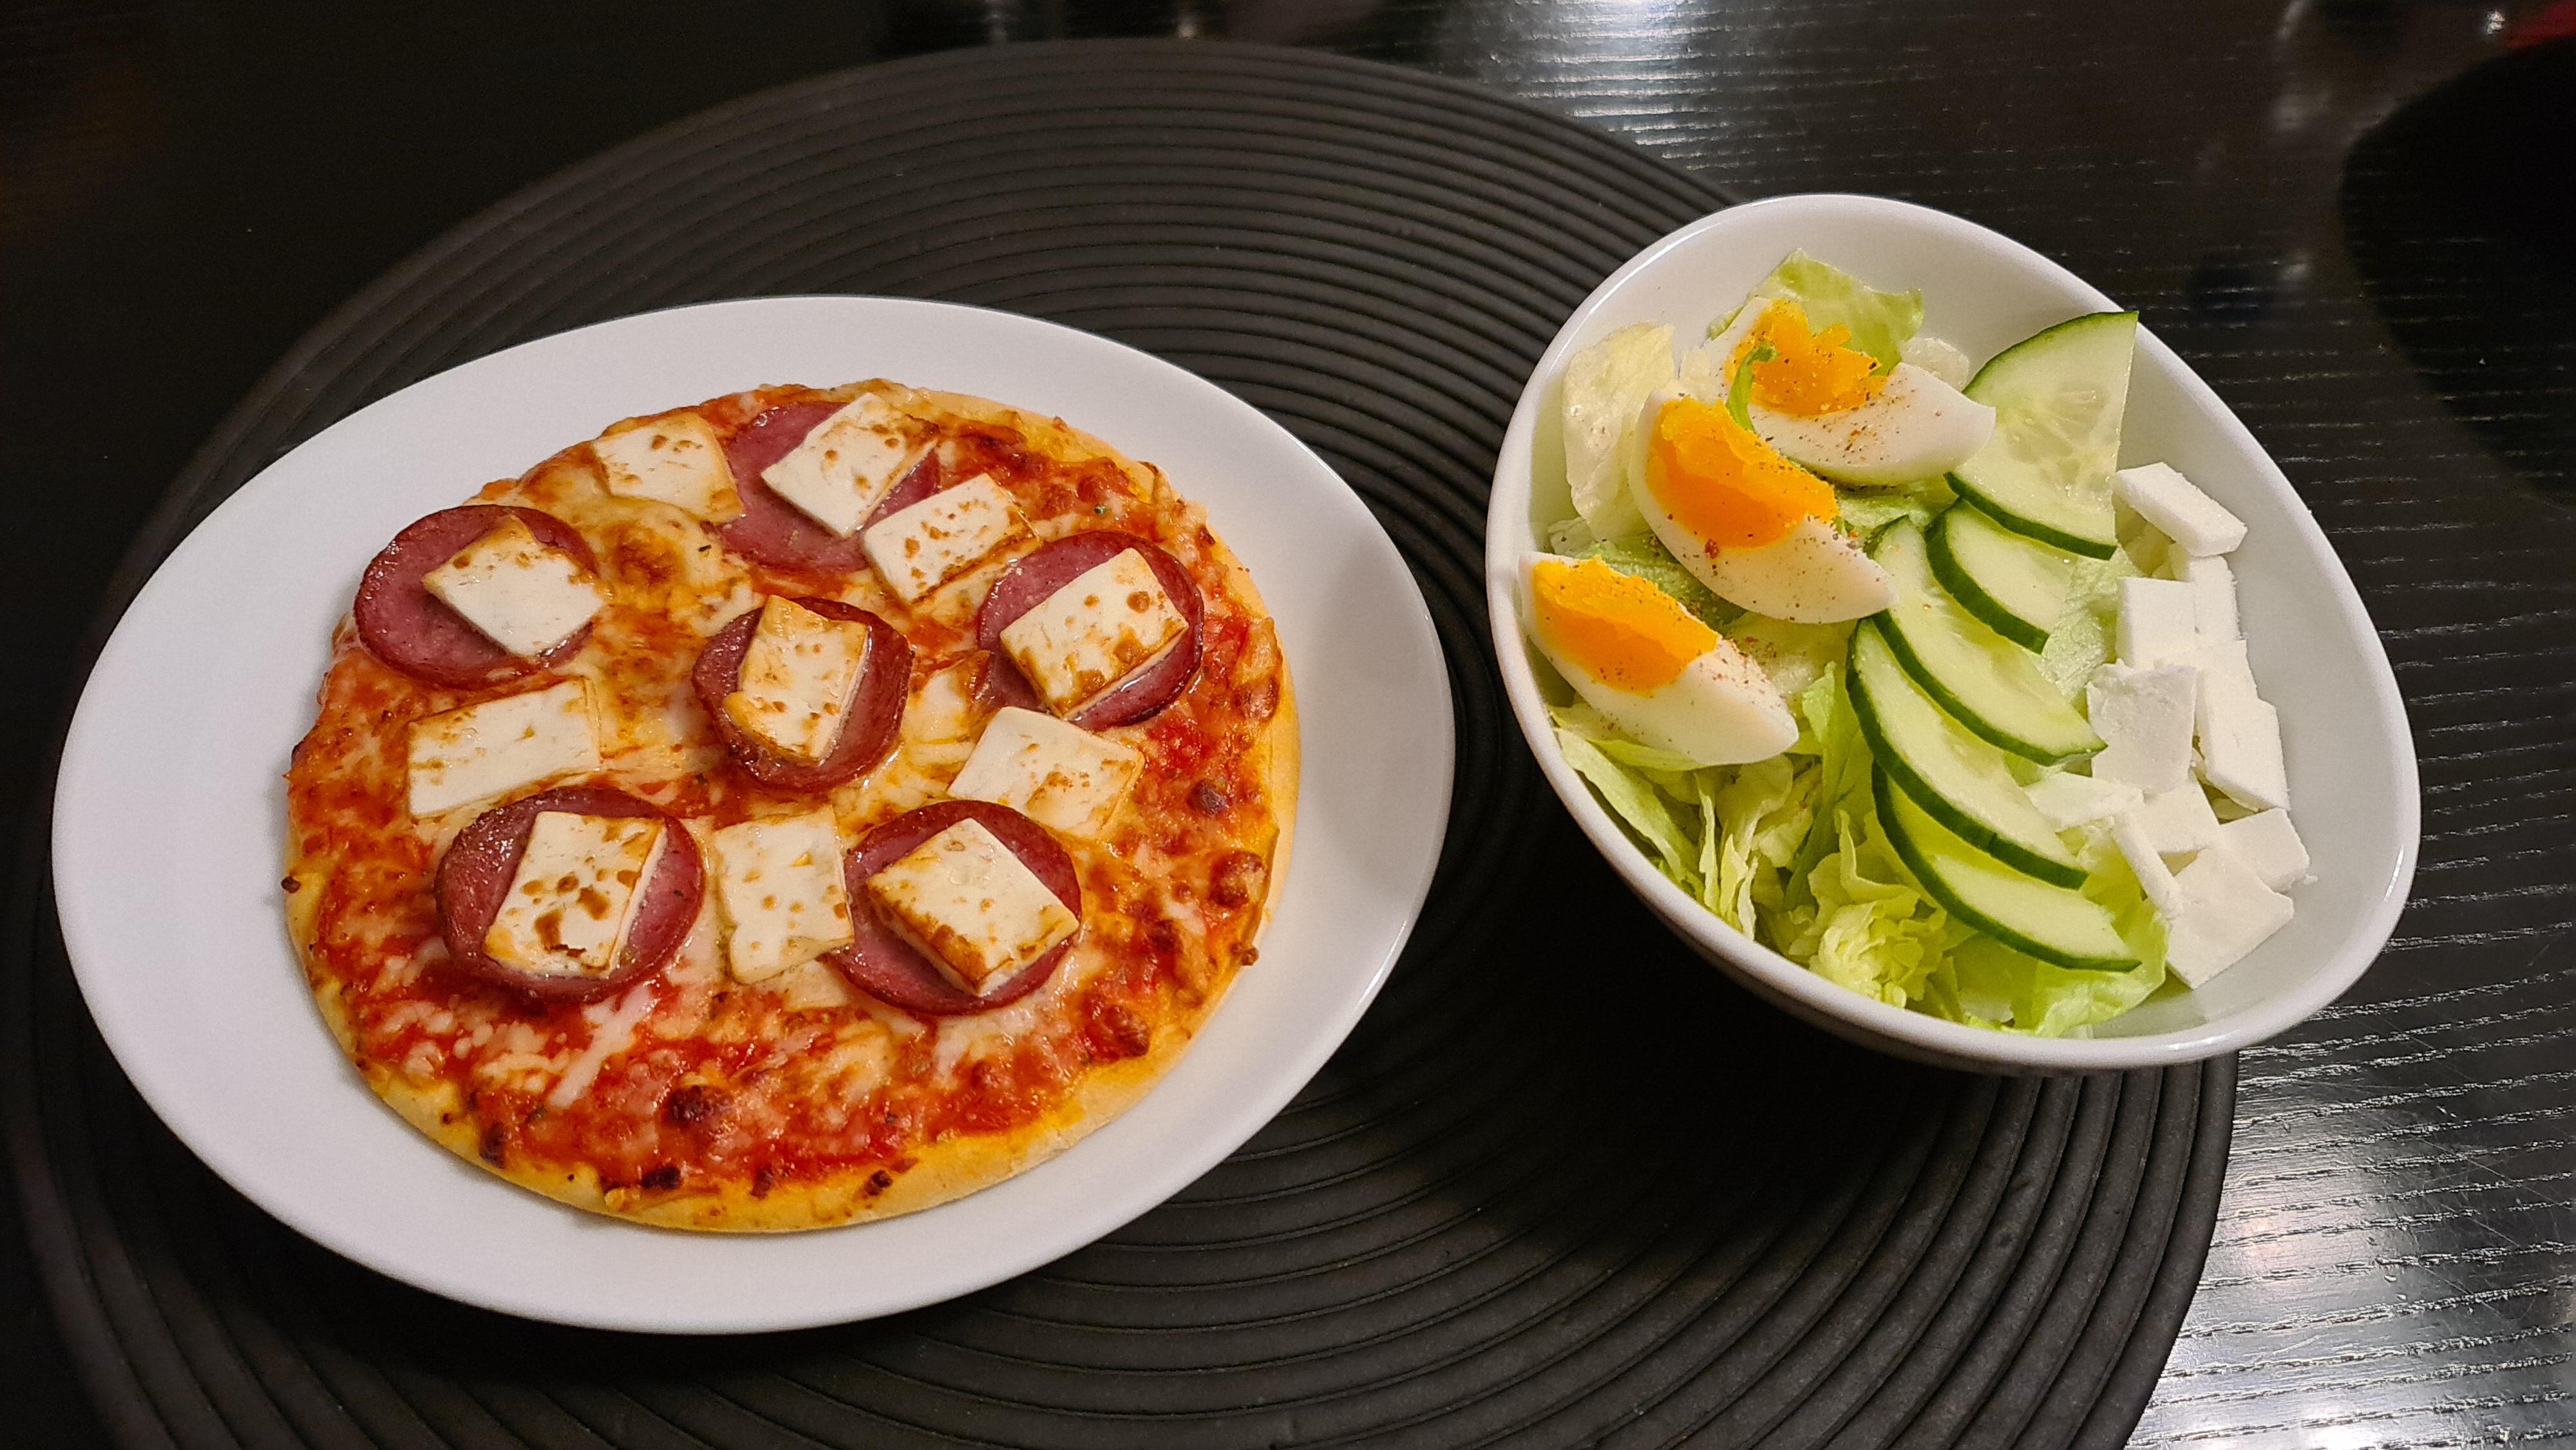 https://foodloader.net/Holz_2020-12-29_Mini-Pizza_1_und_Salat_1.jpg